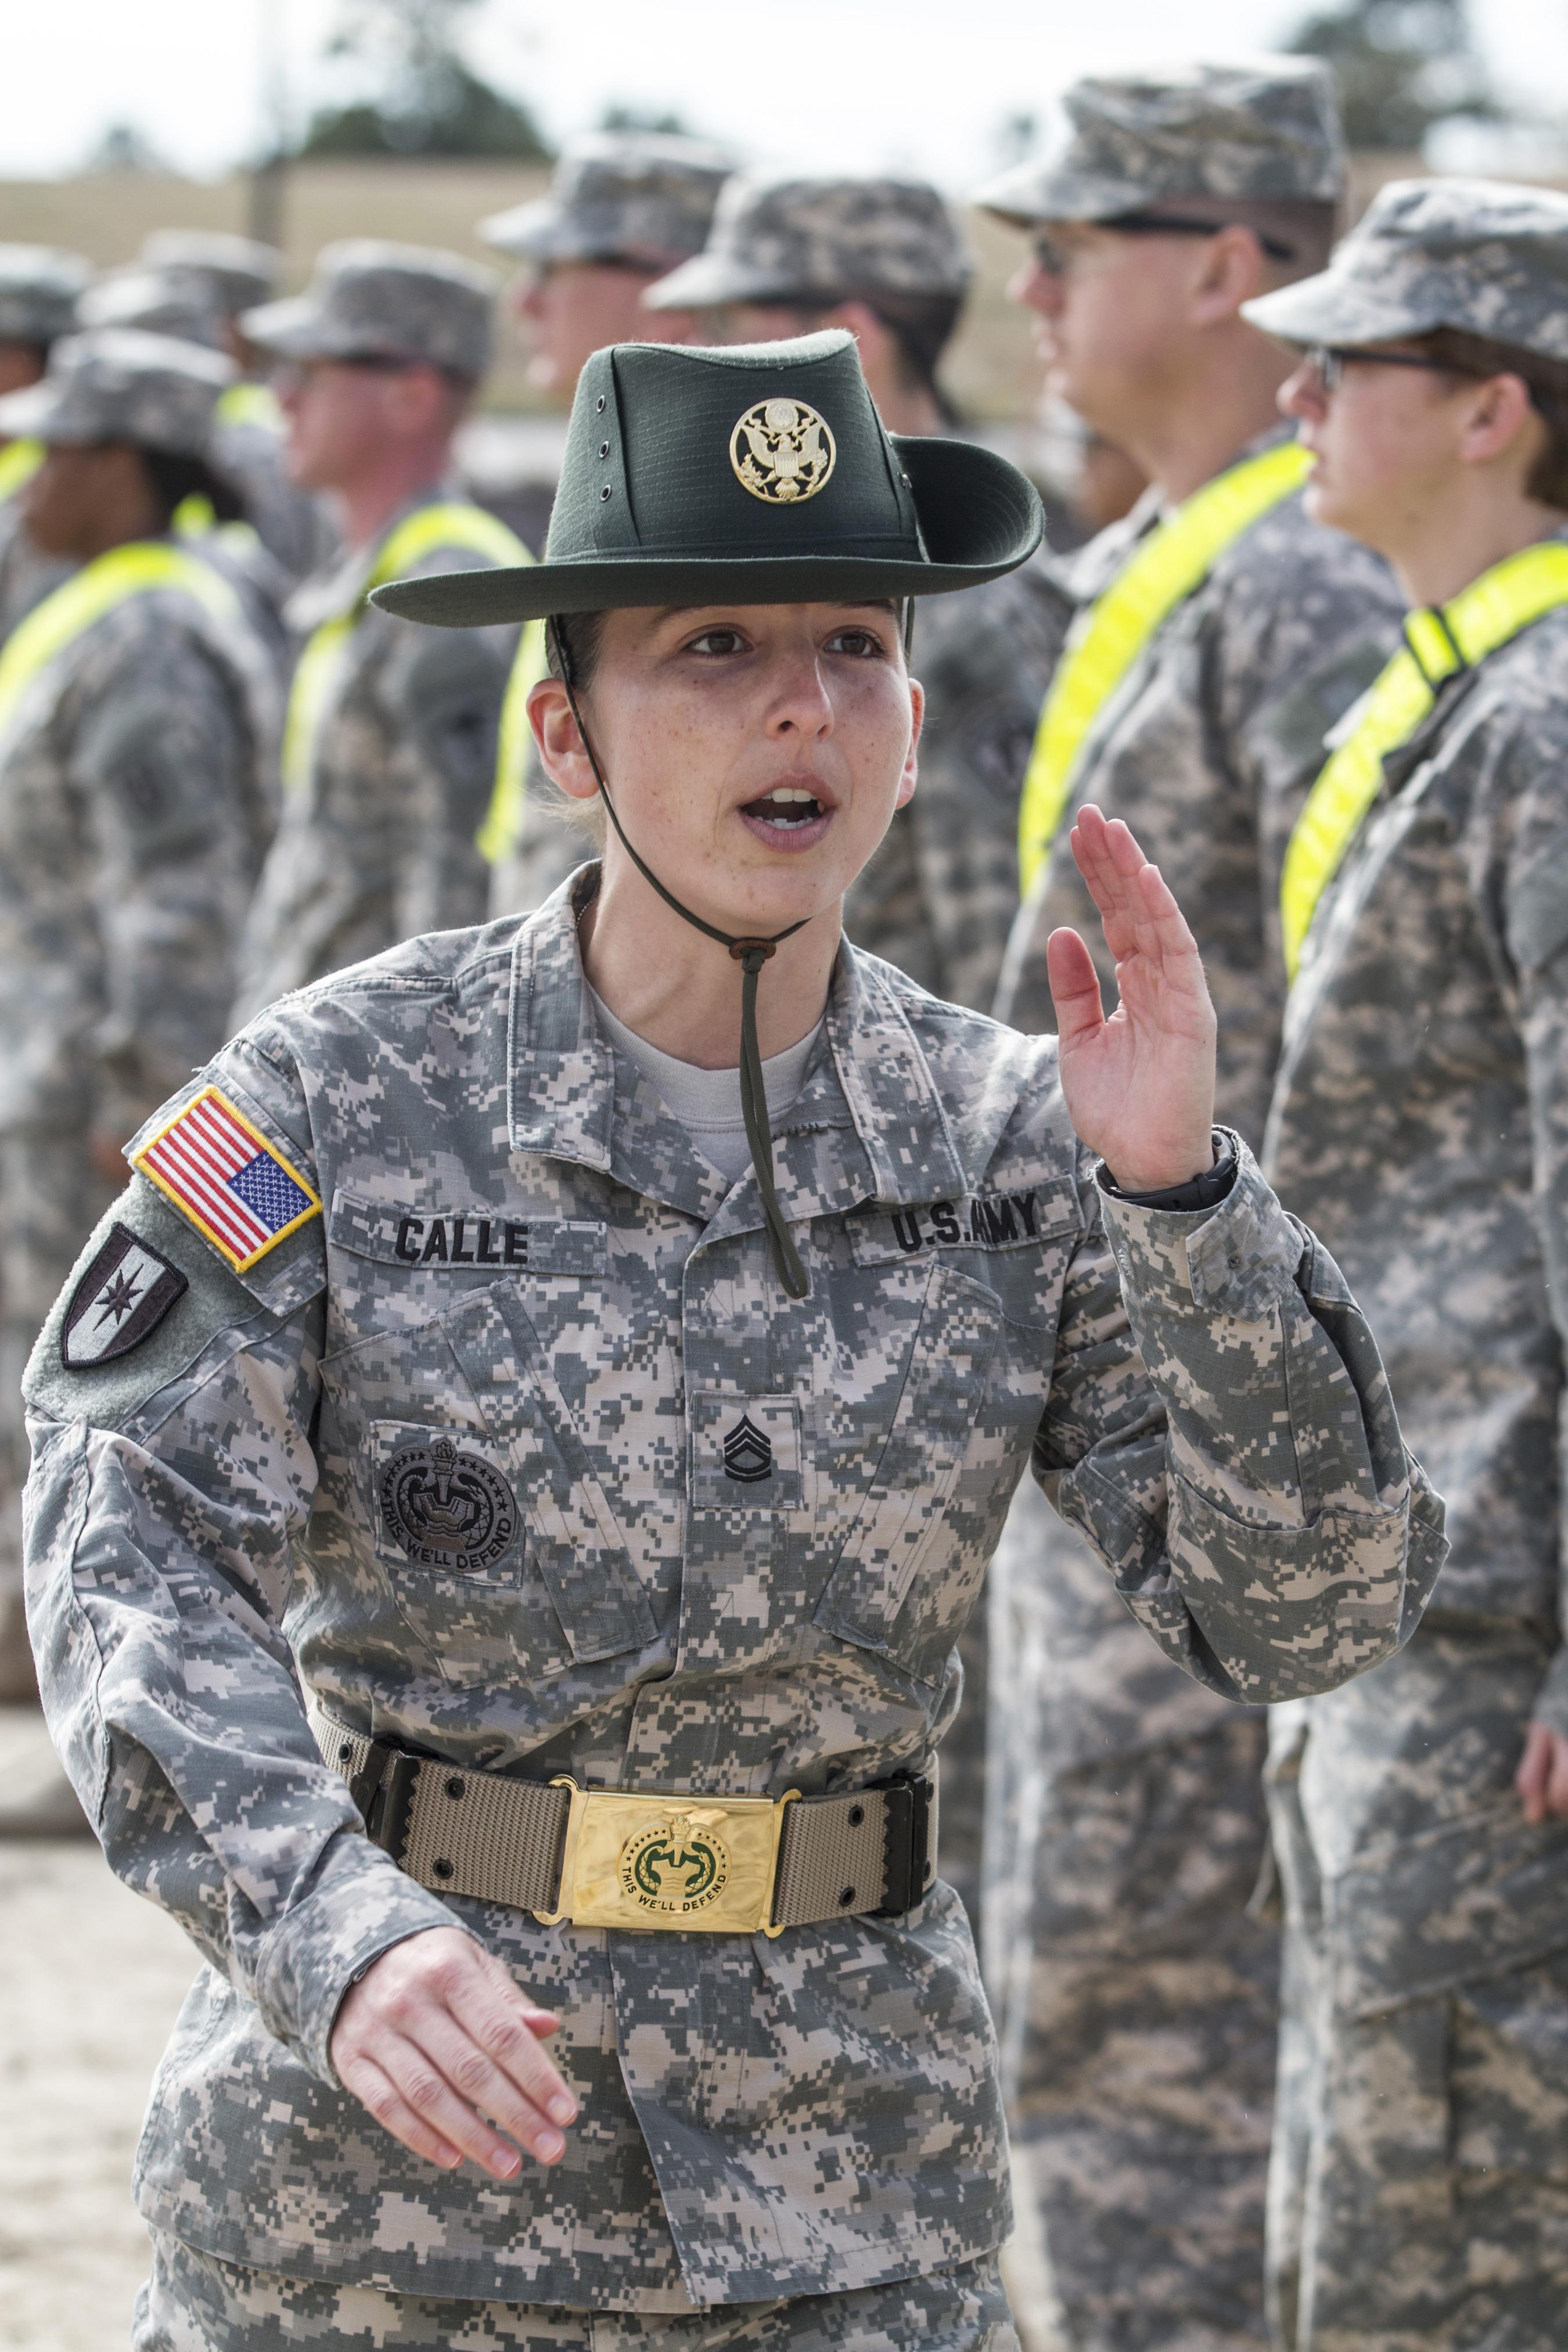 armylookinghundredsncosdrillsergeantduty